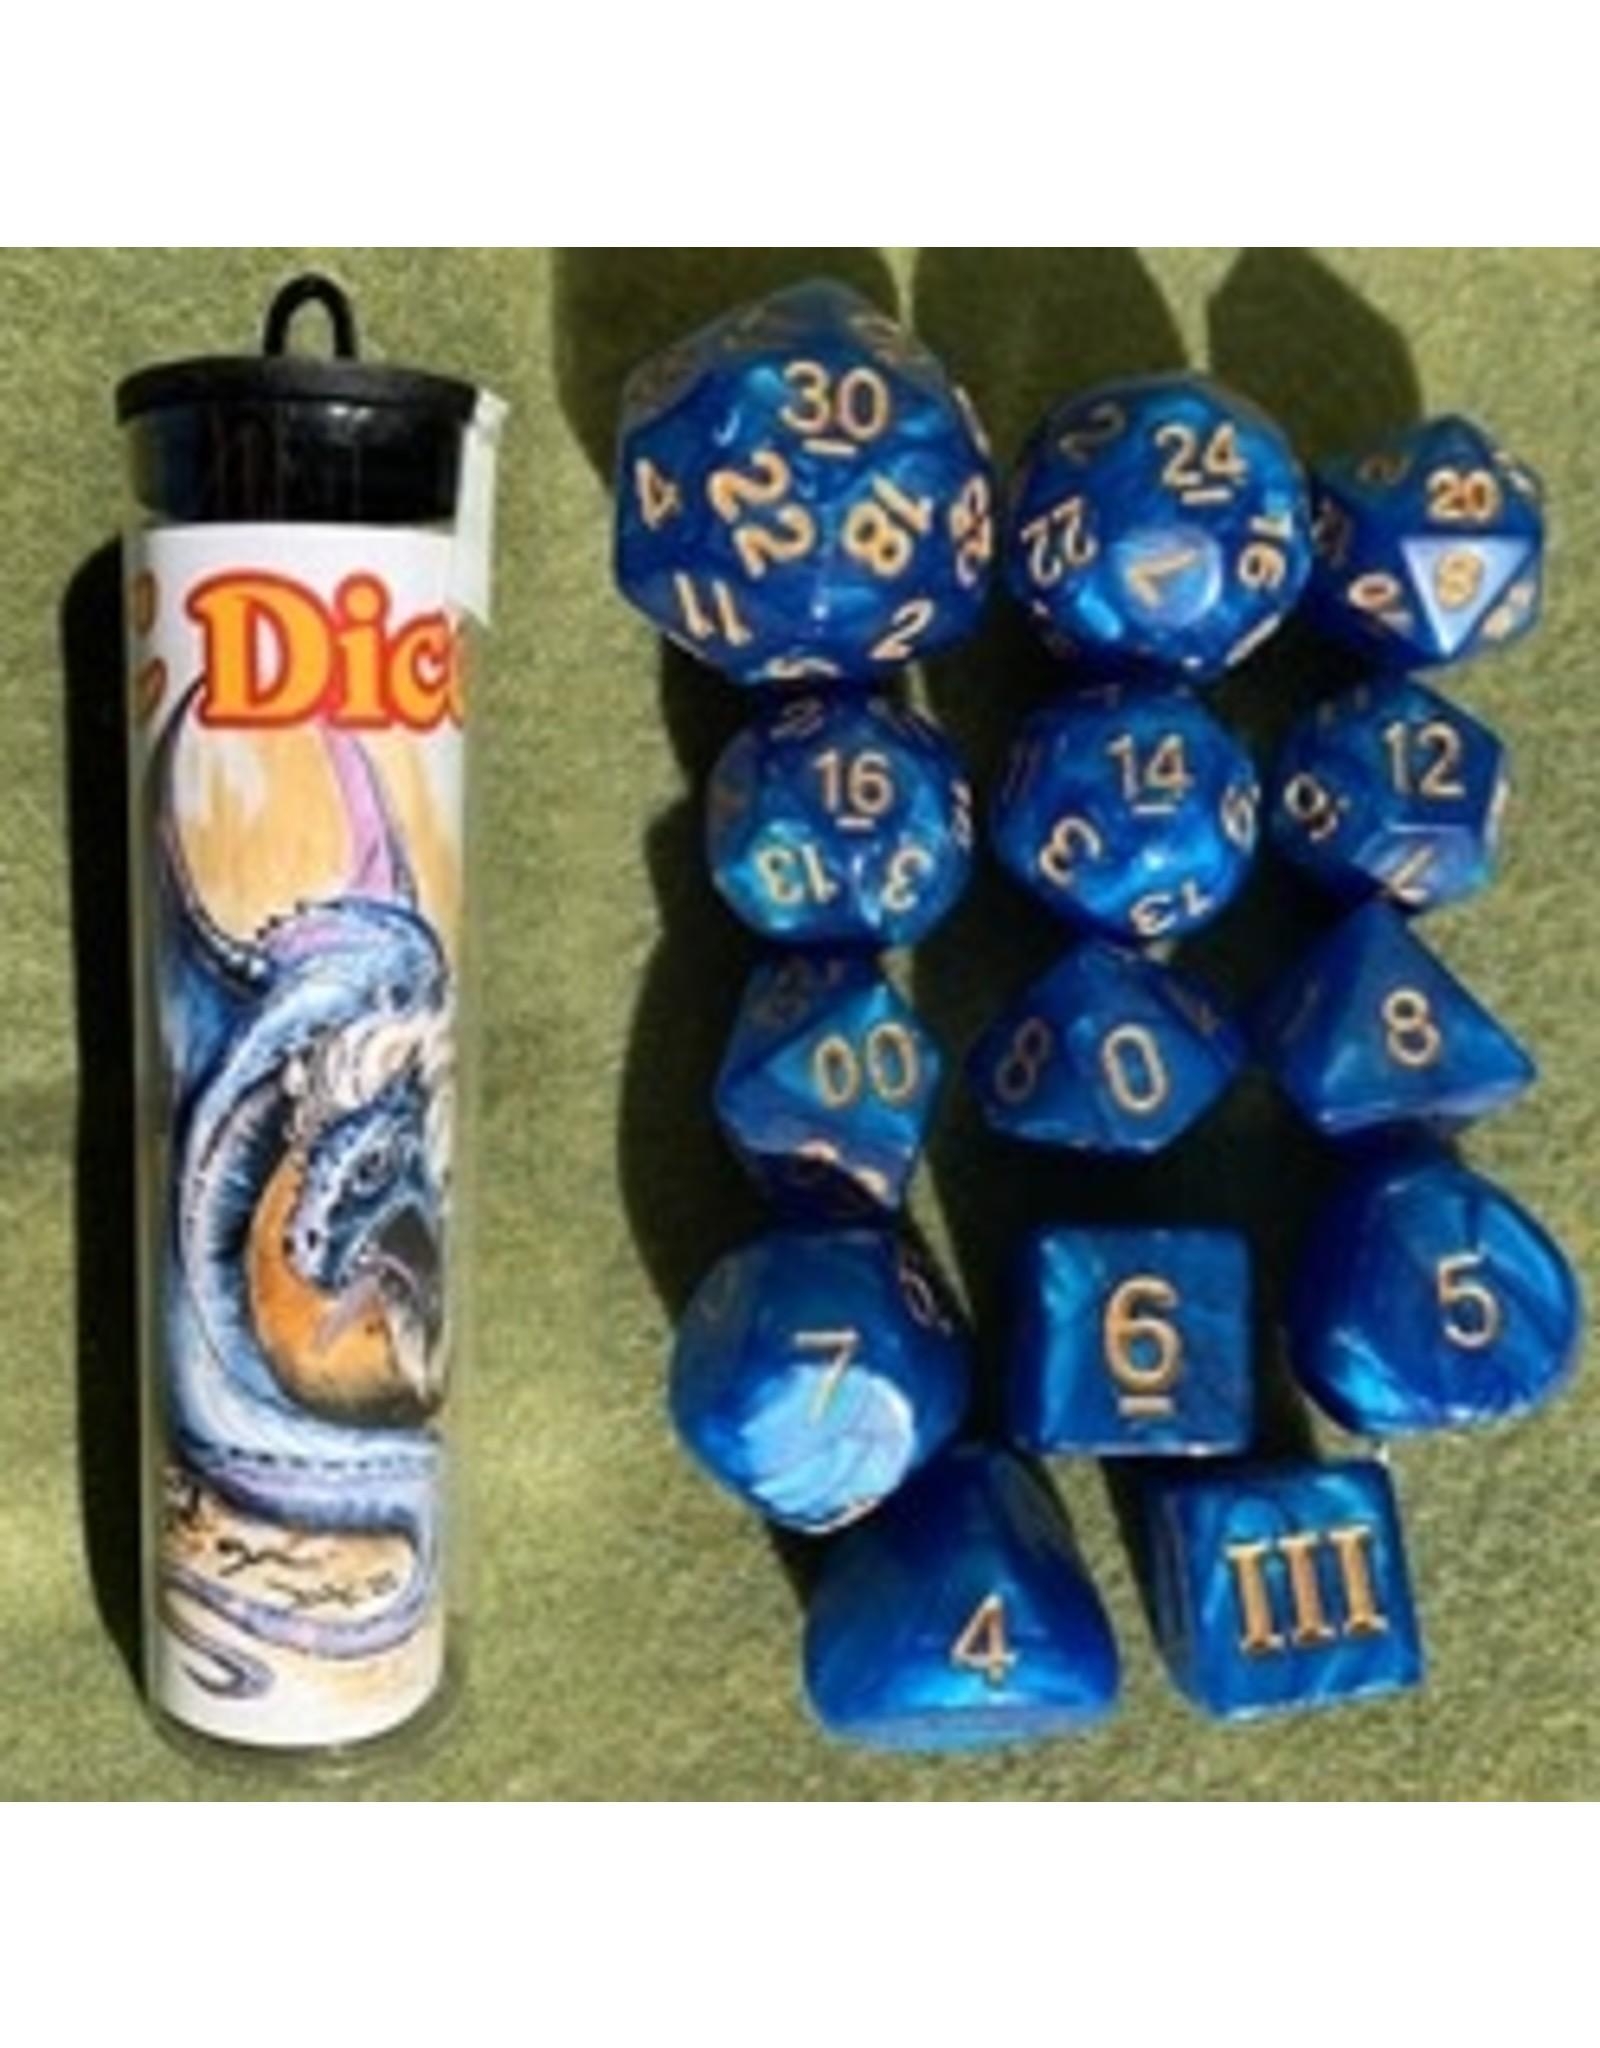 14PC DCC RPG DICE - MANED WYRM